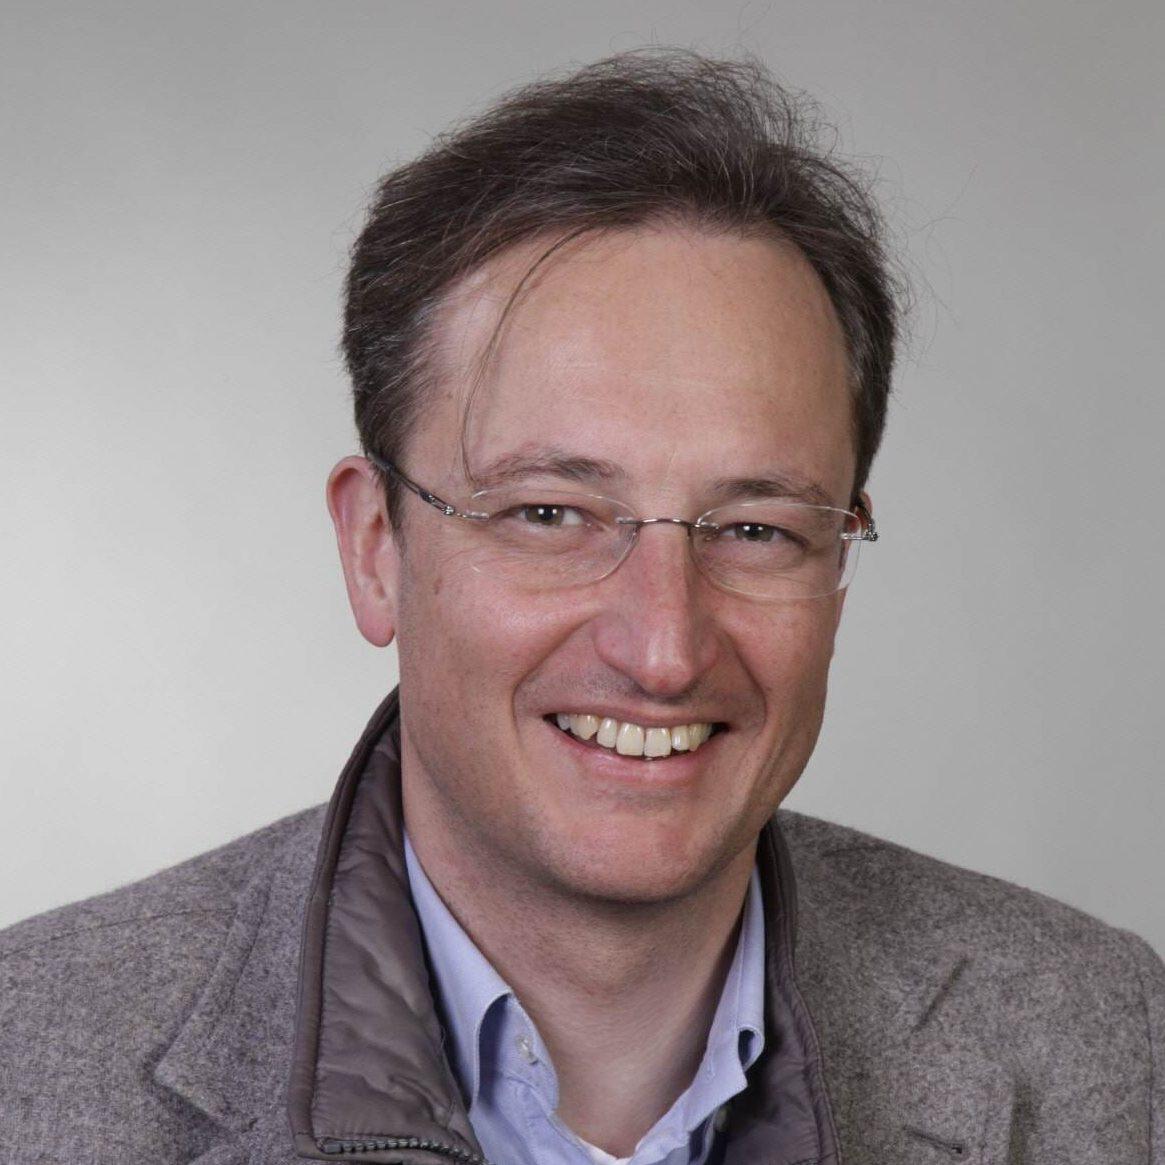 Michael Mayrhofer